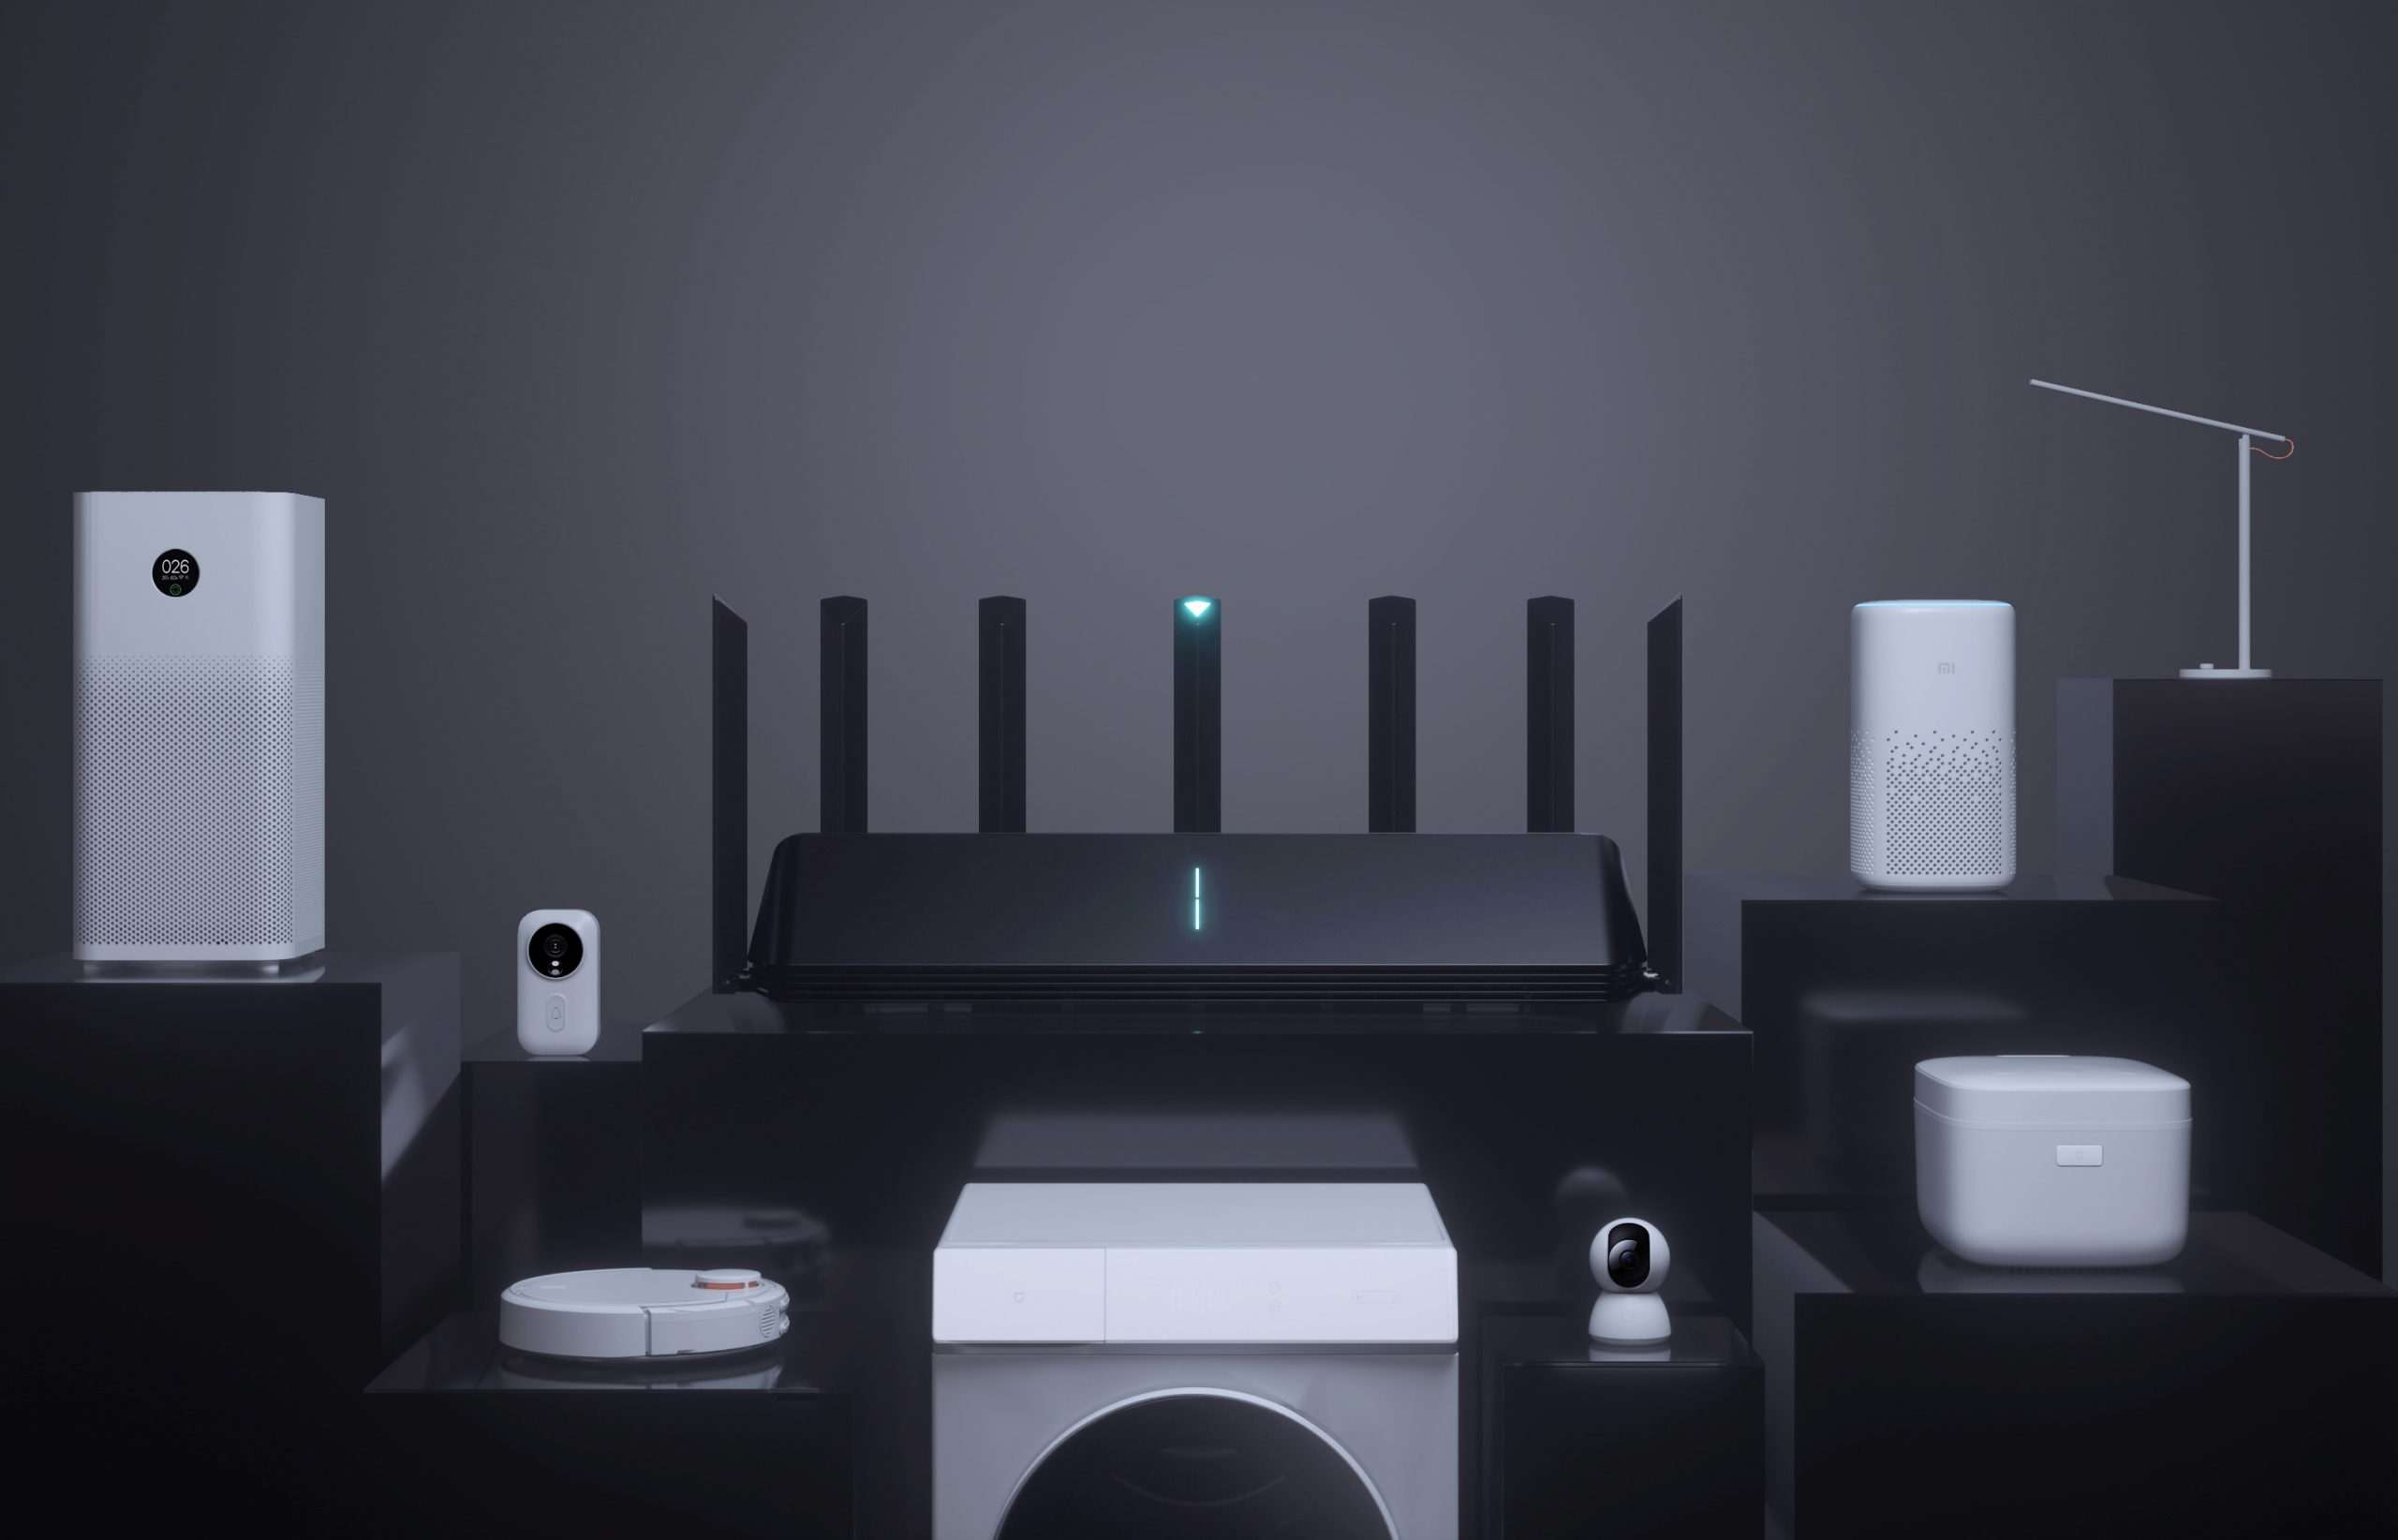 Xiaomi Mi AIoT Router